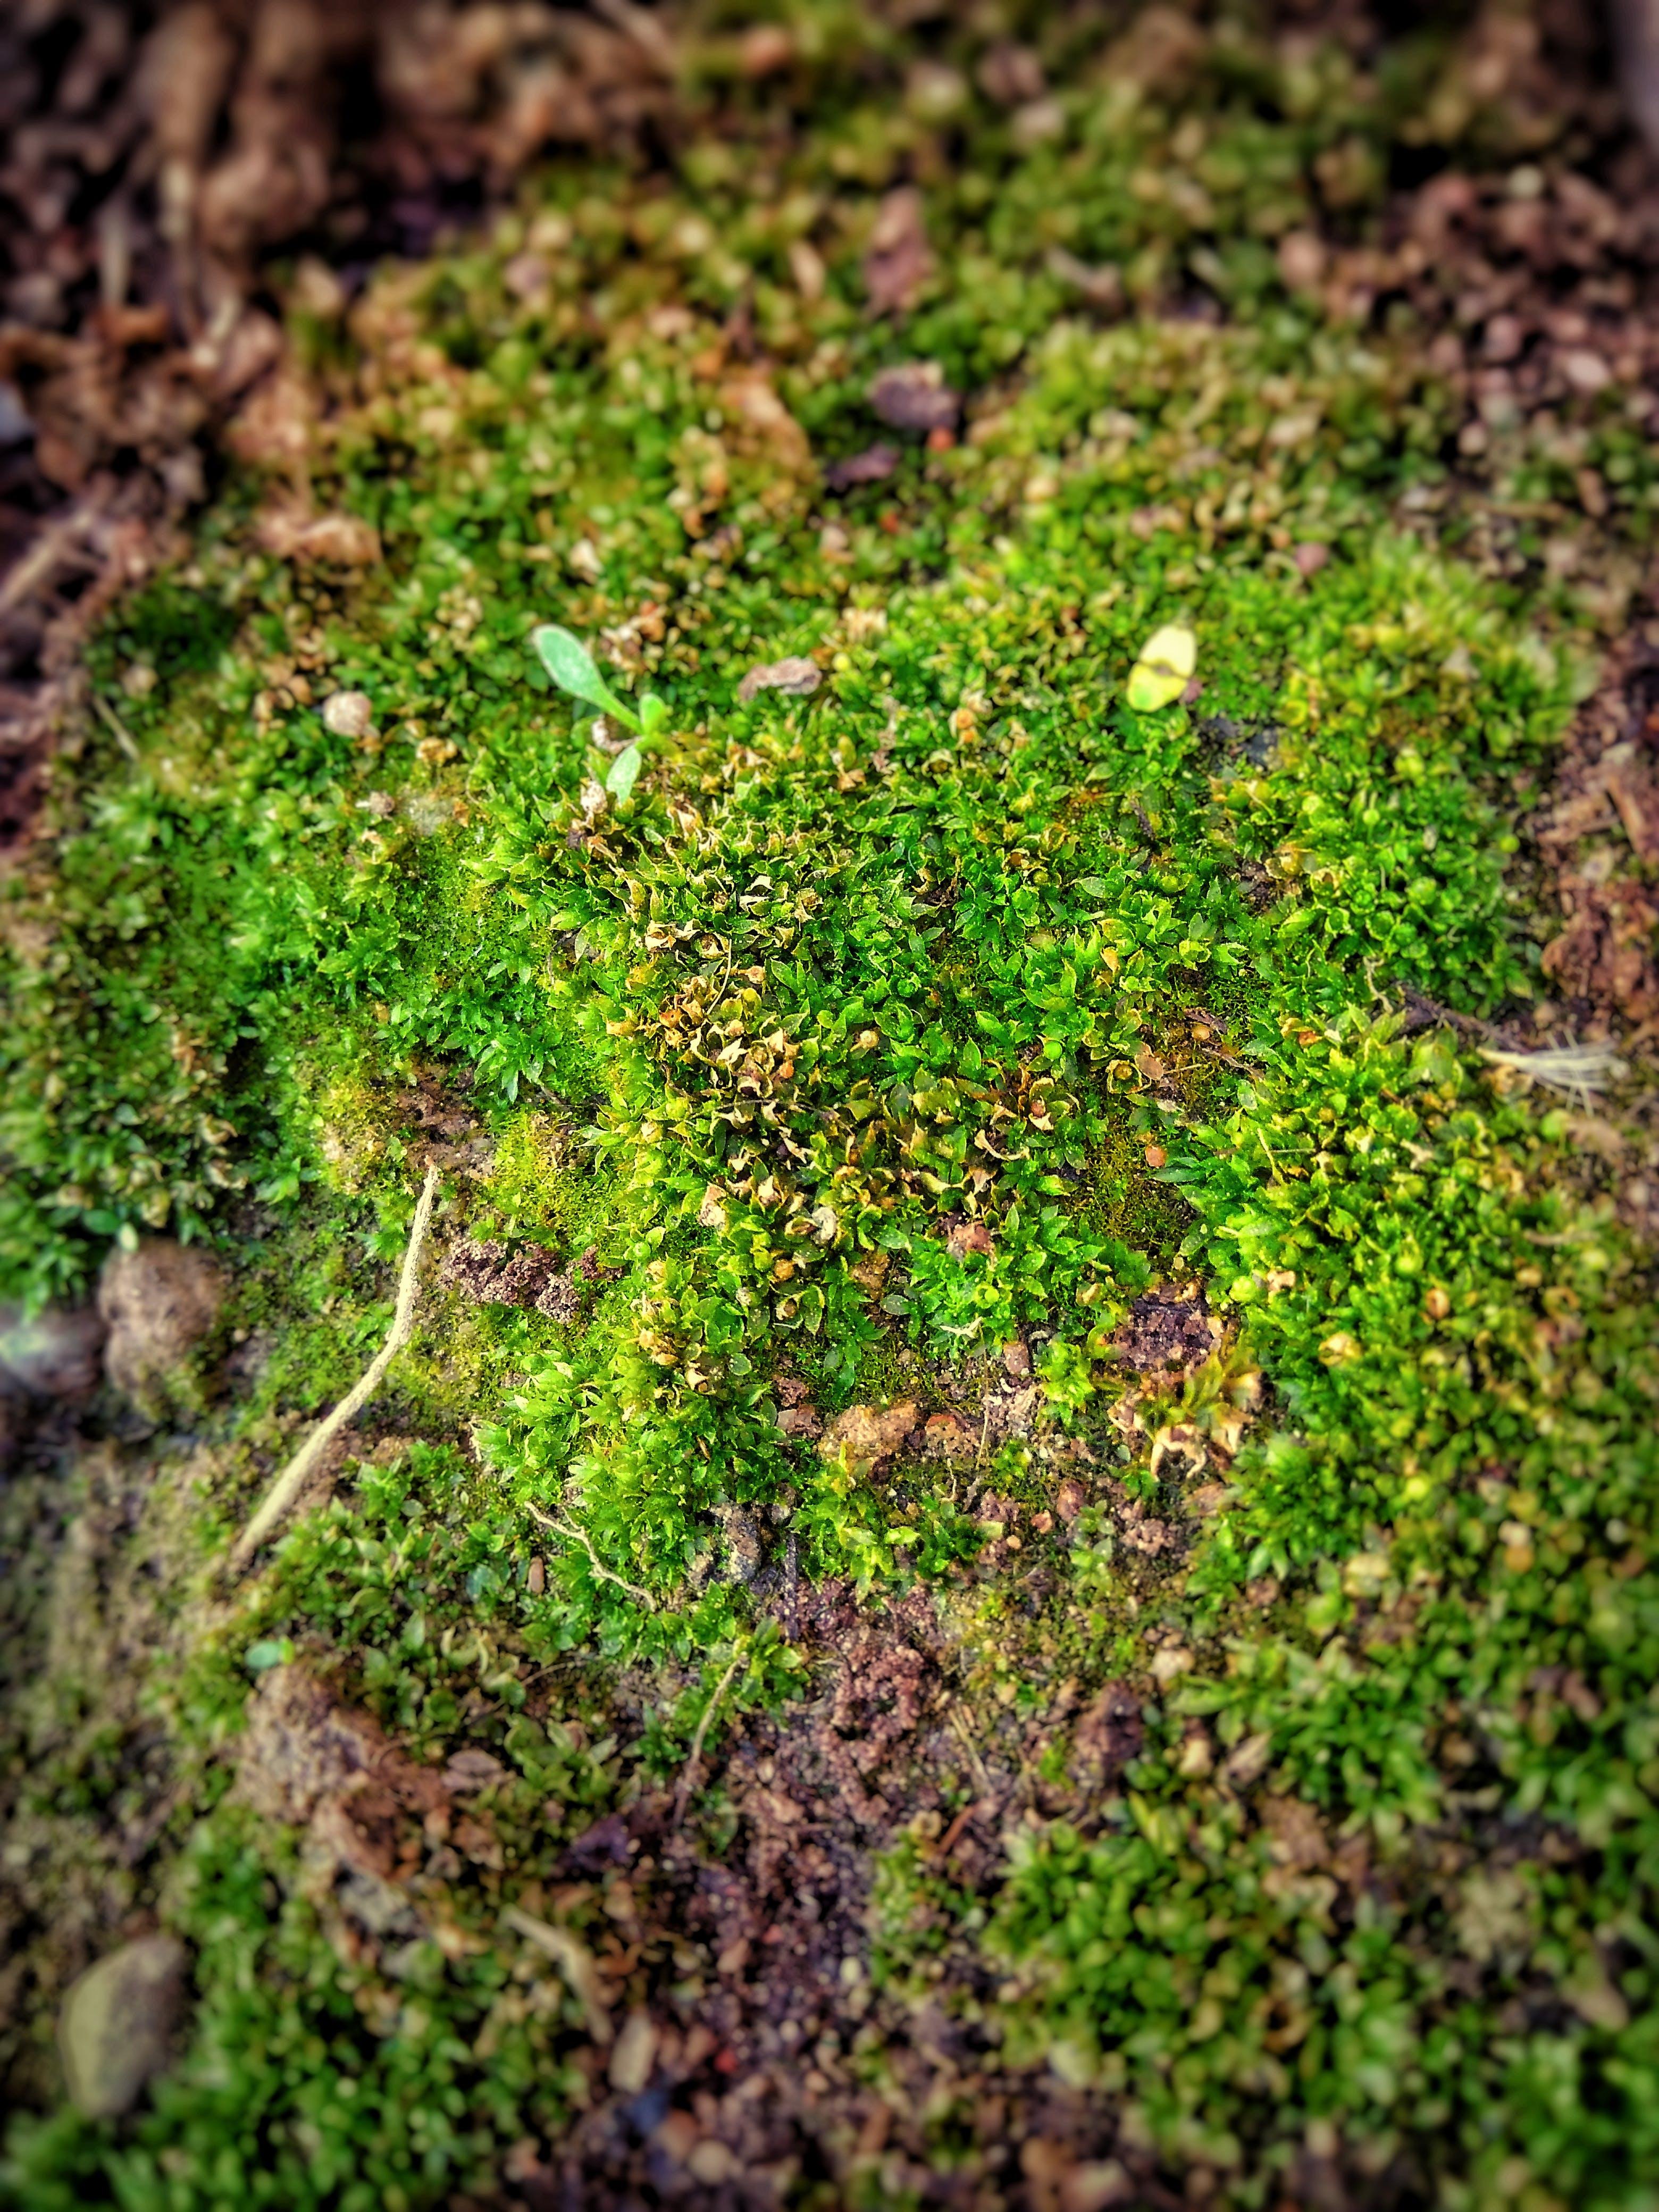 Shallow Focus Photo of Green Moss